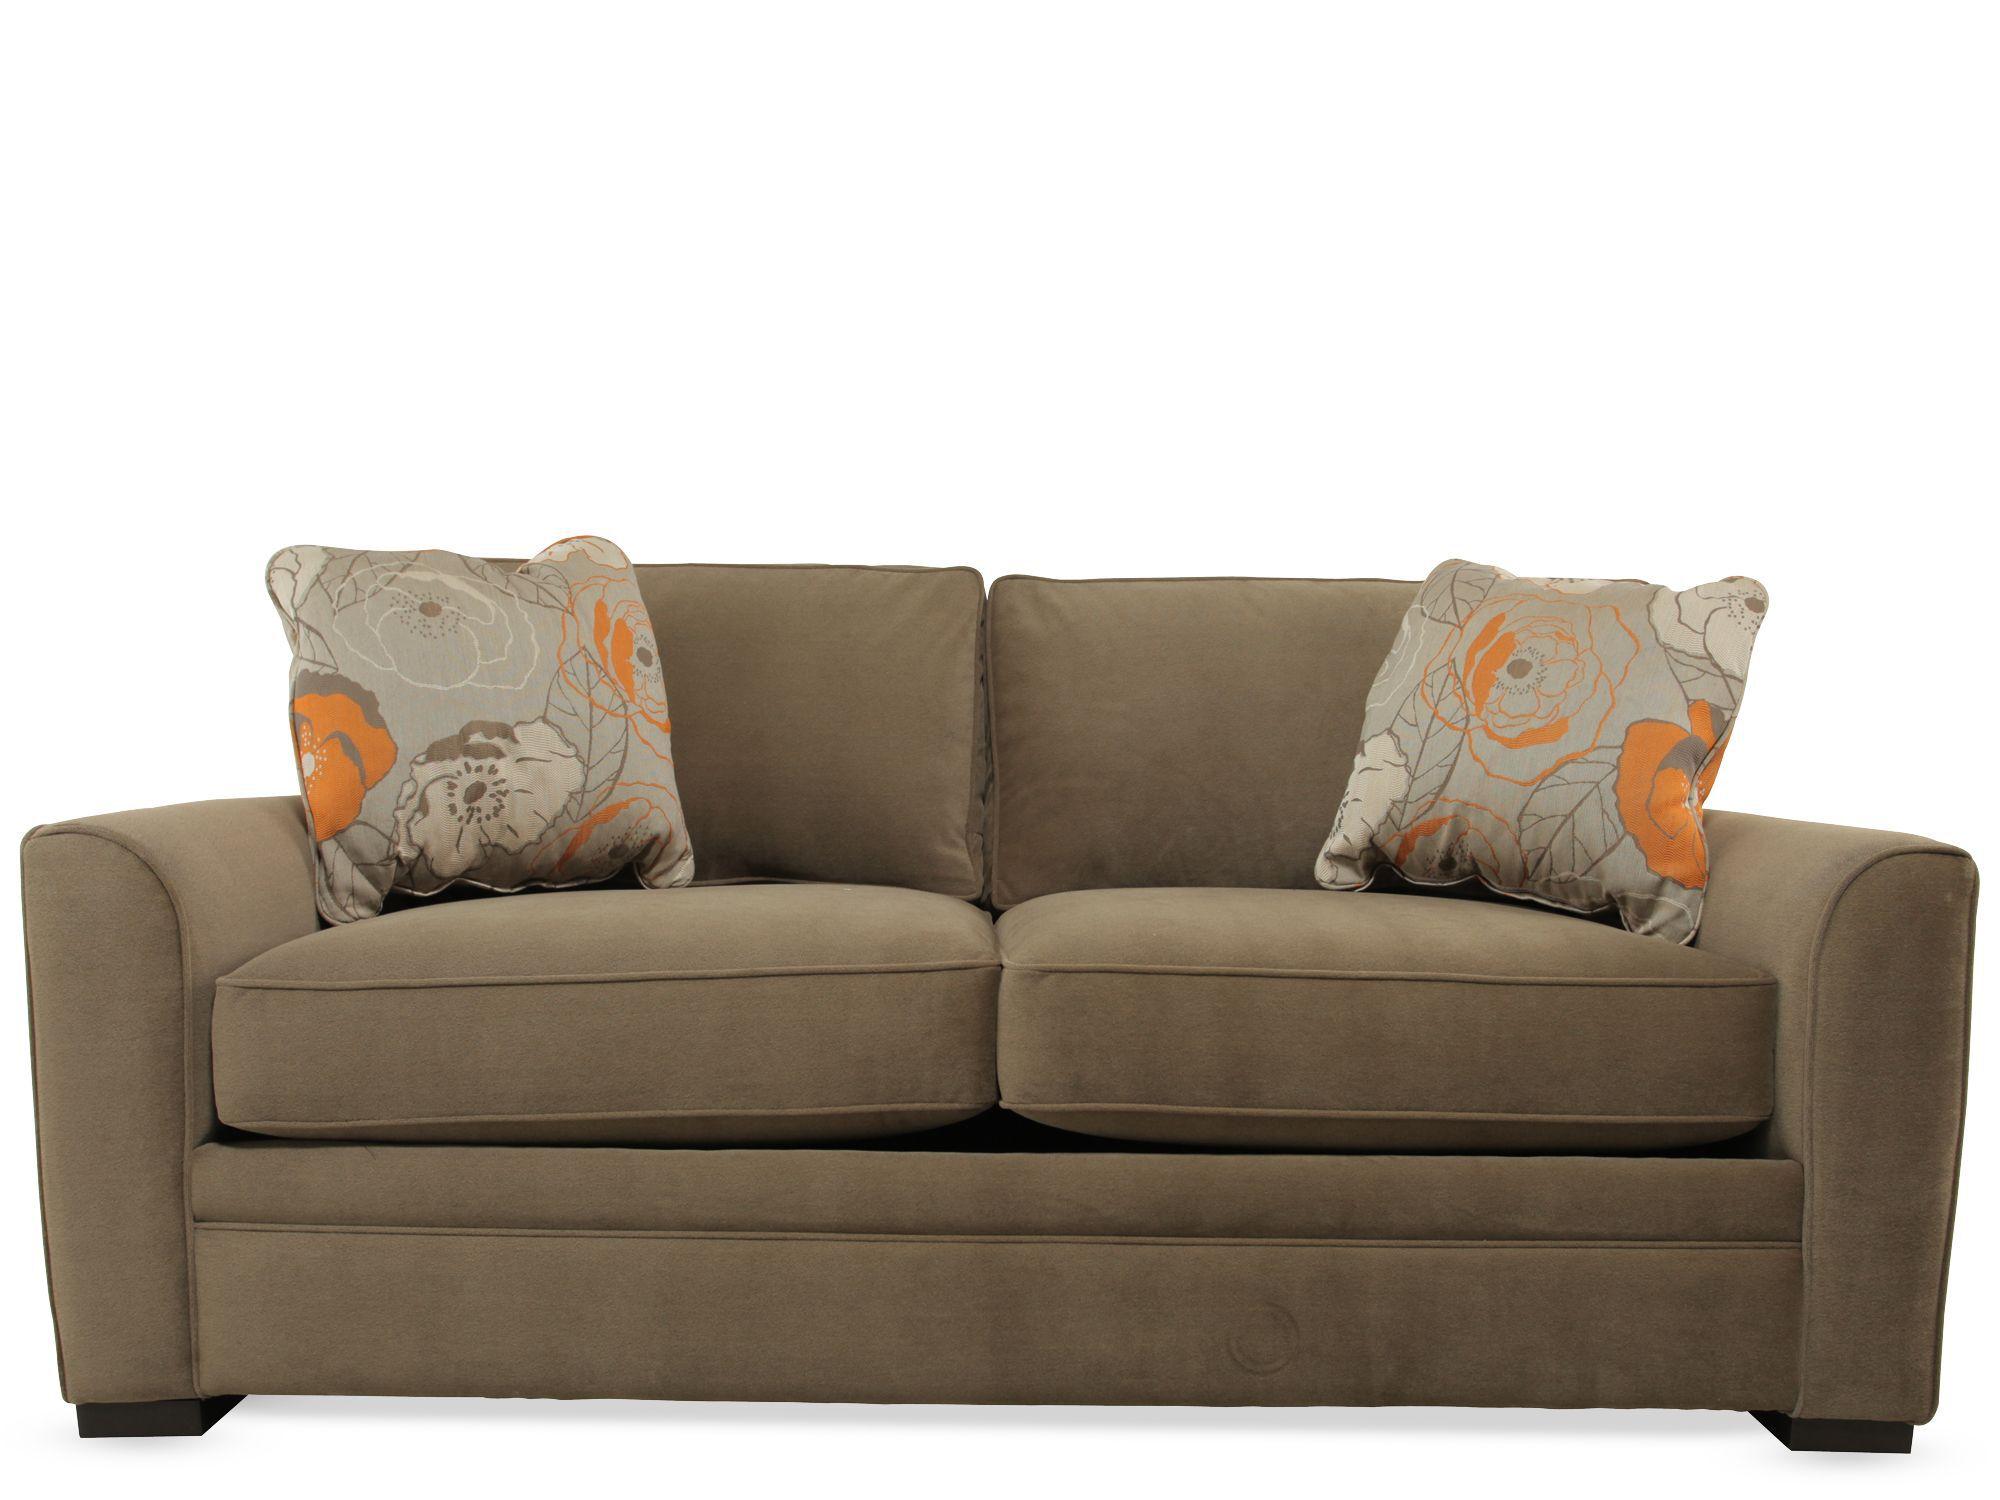 Images Casual 81u0026quot; Full Sleeper Sofa In Brown Casual 81u0026quot; Full Sleeper  Sofa In Brown